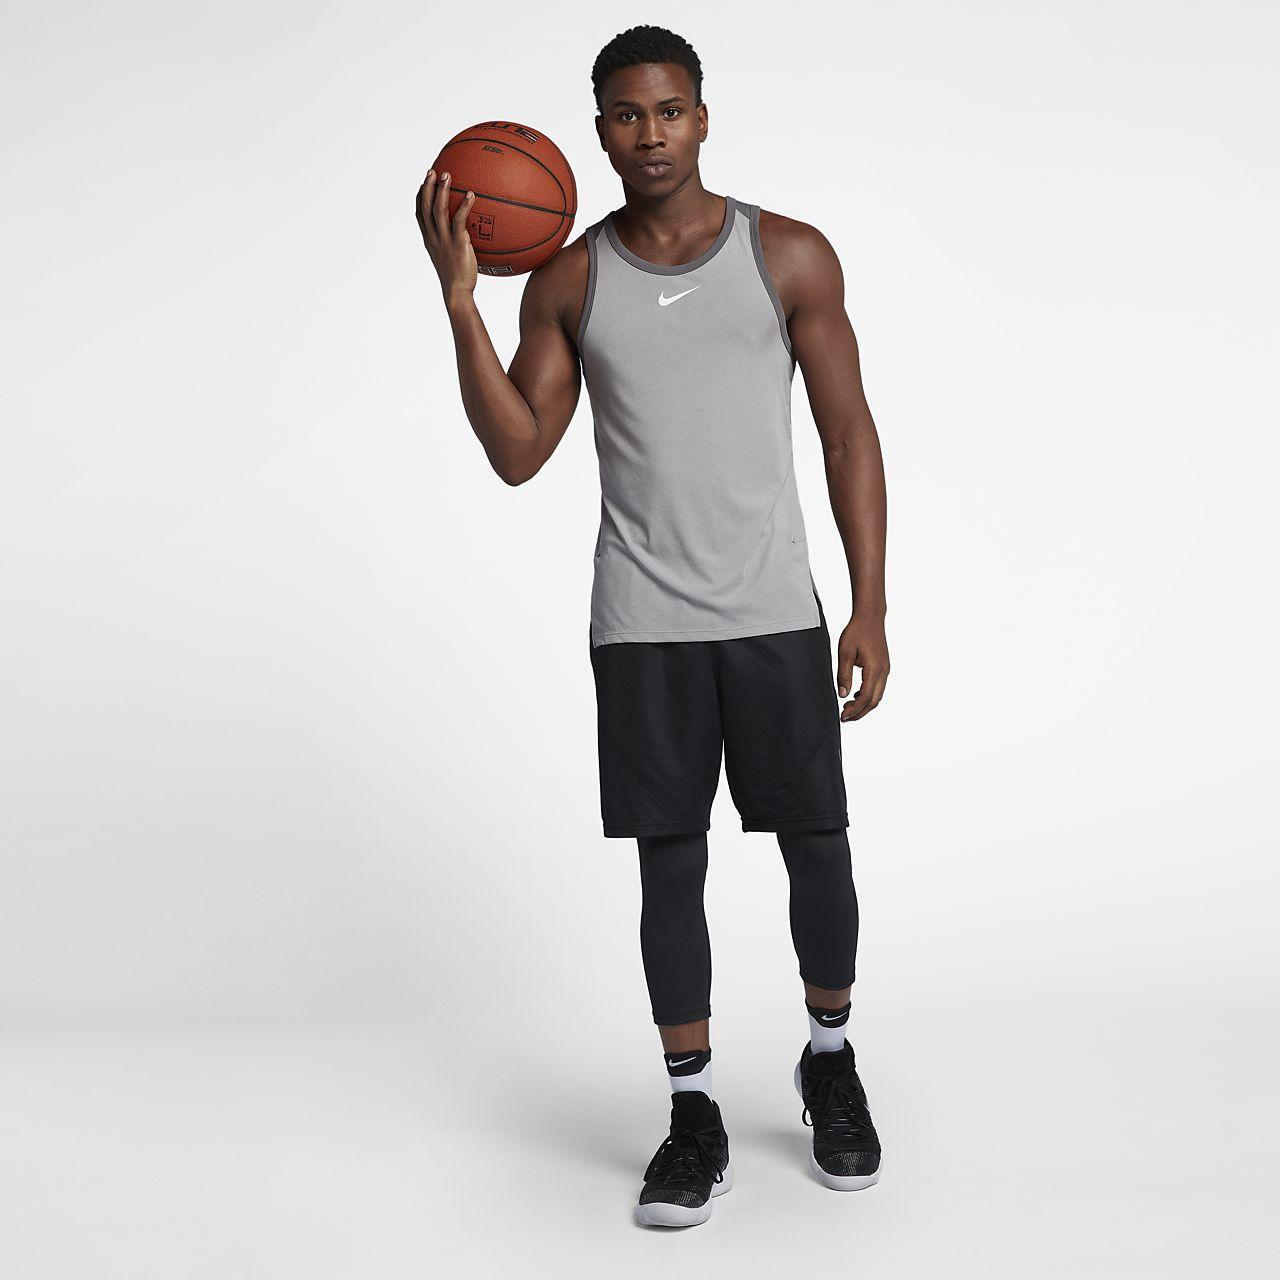 461ca46fa52732 Nike Breathe Elite Men s Sleeveless Basketball Top. Nike.com AE